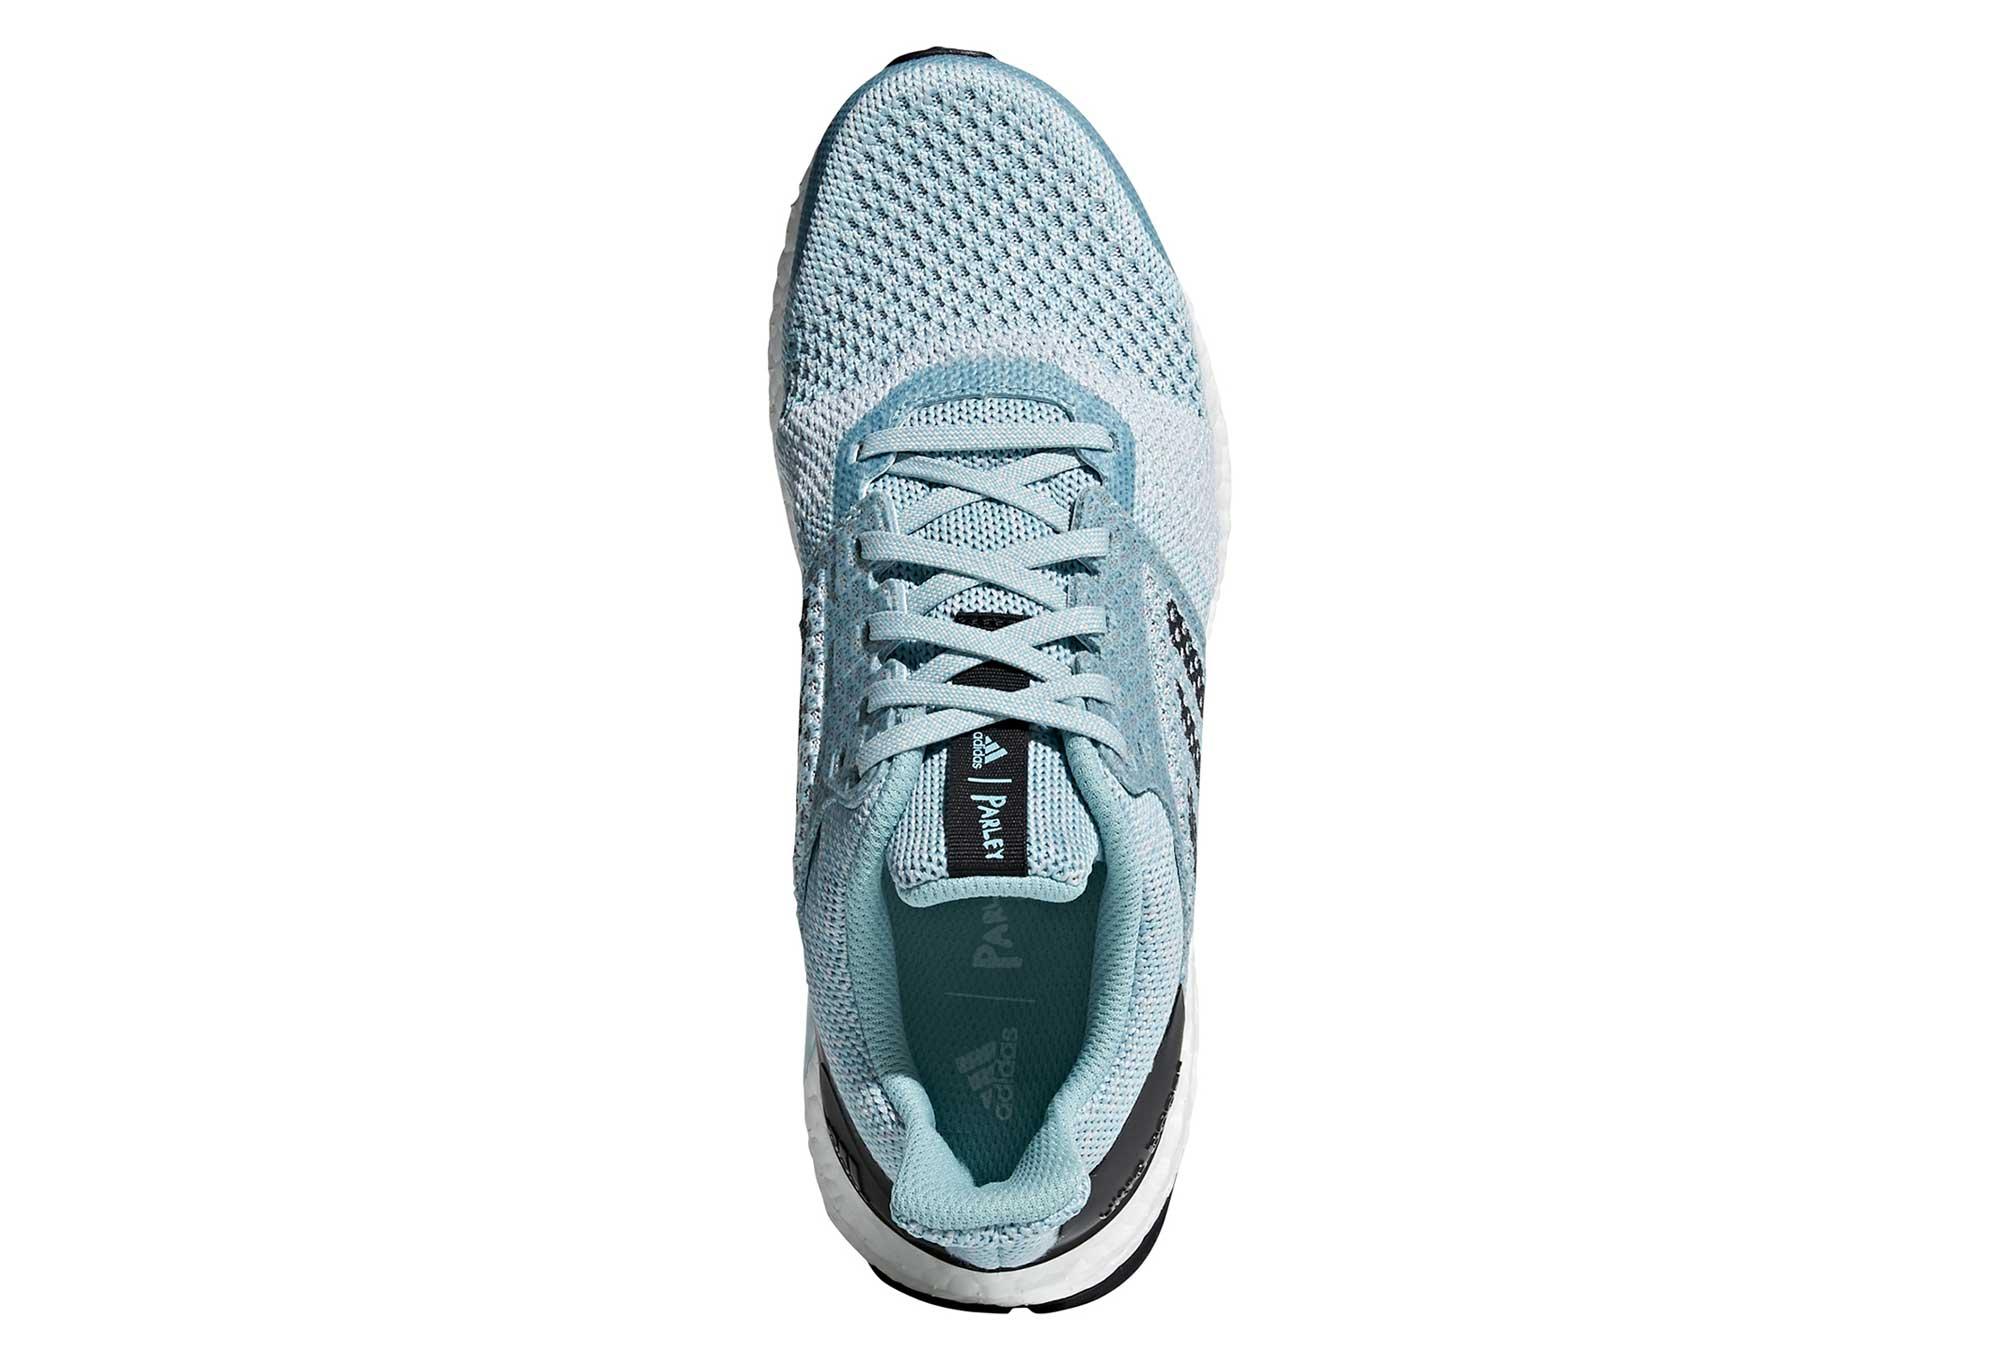 adidas läuft mit Ultraboost ST Parley Light Blue Women